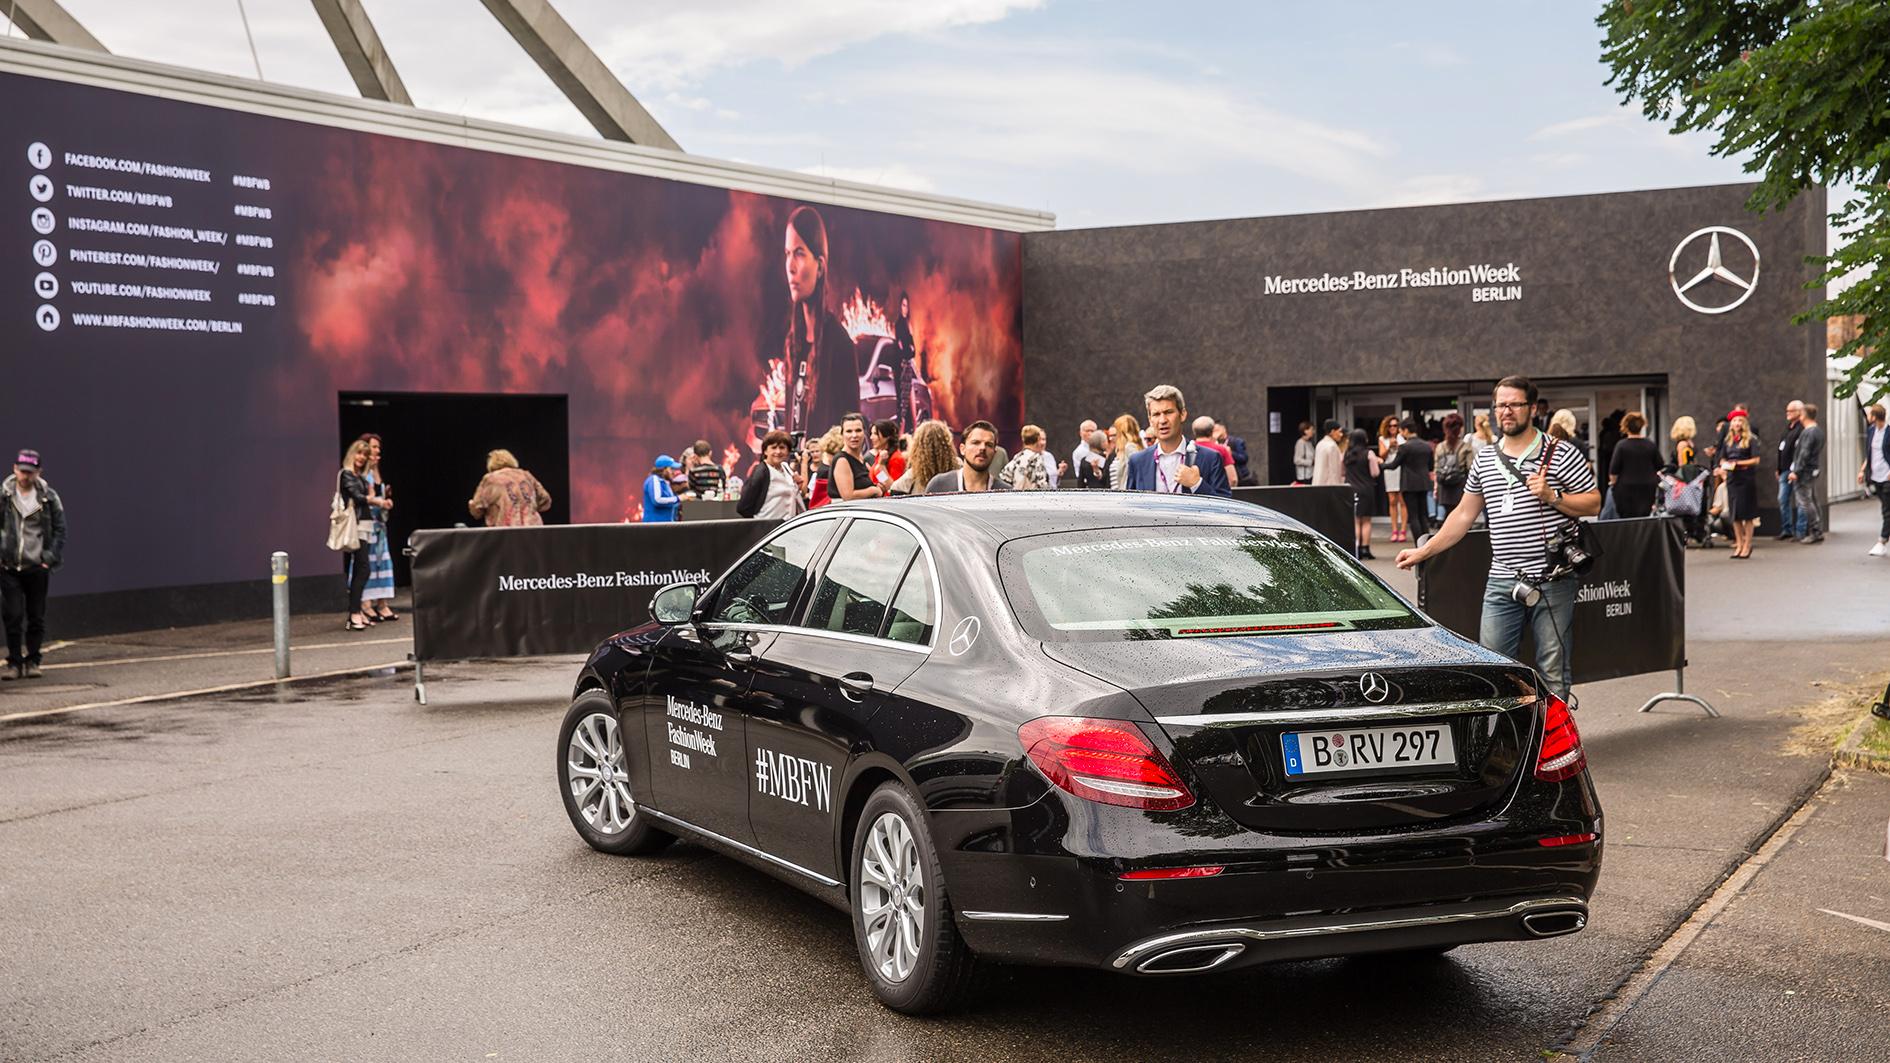 Mercedes benz fashion week berlin 2016 die autotester for Mercedes benz clothes